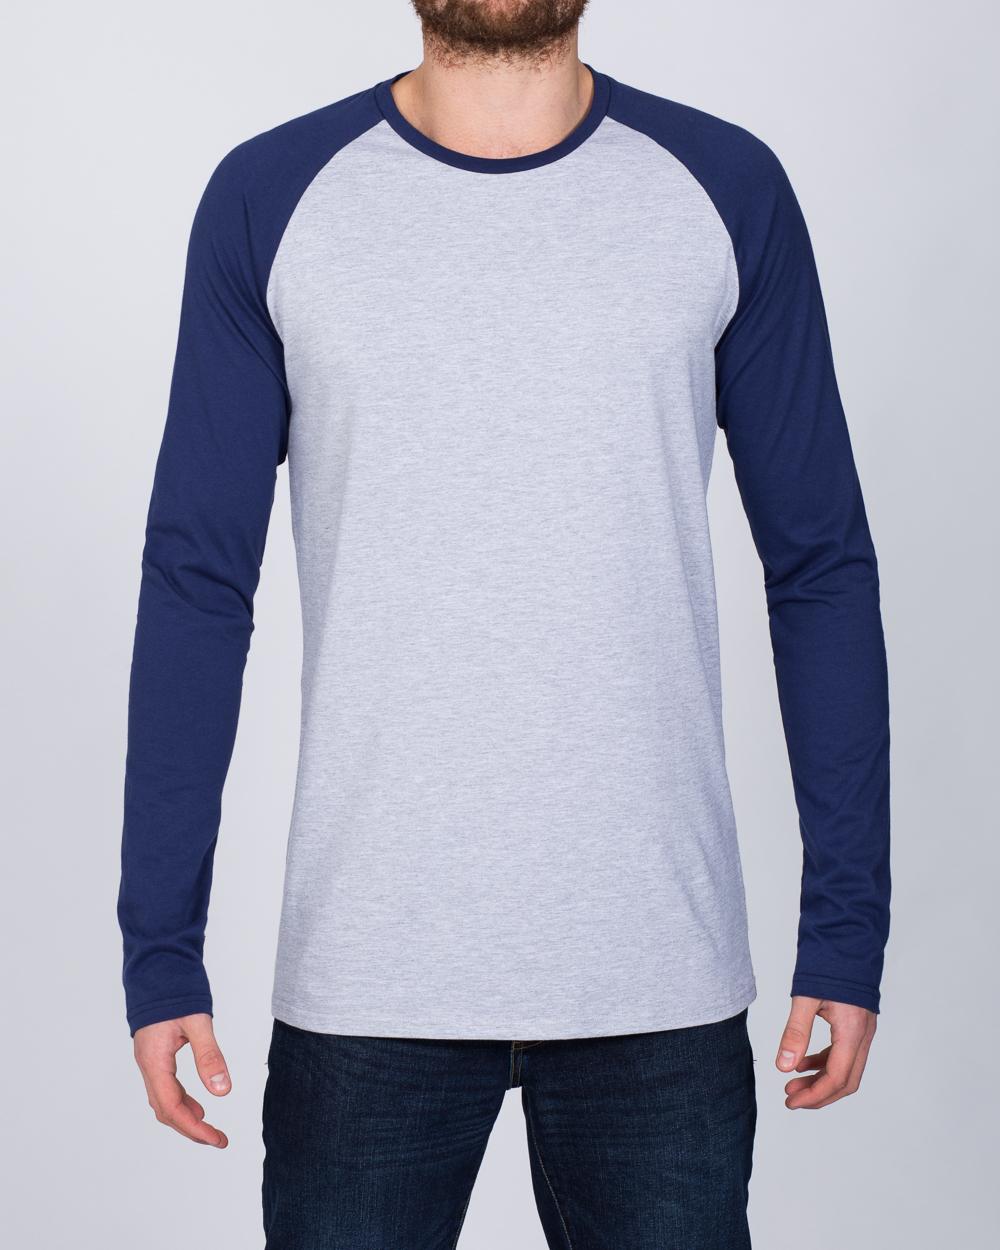 2t Raglan Long Sleeve Tall T-Shirt (grey/navy)